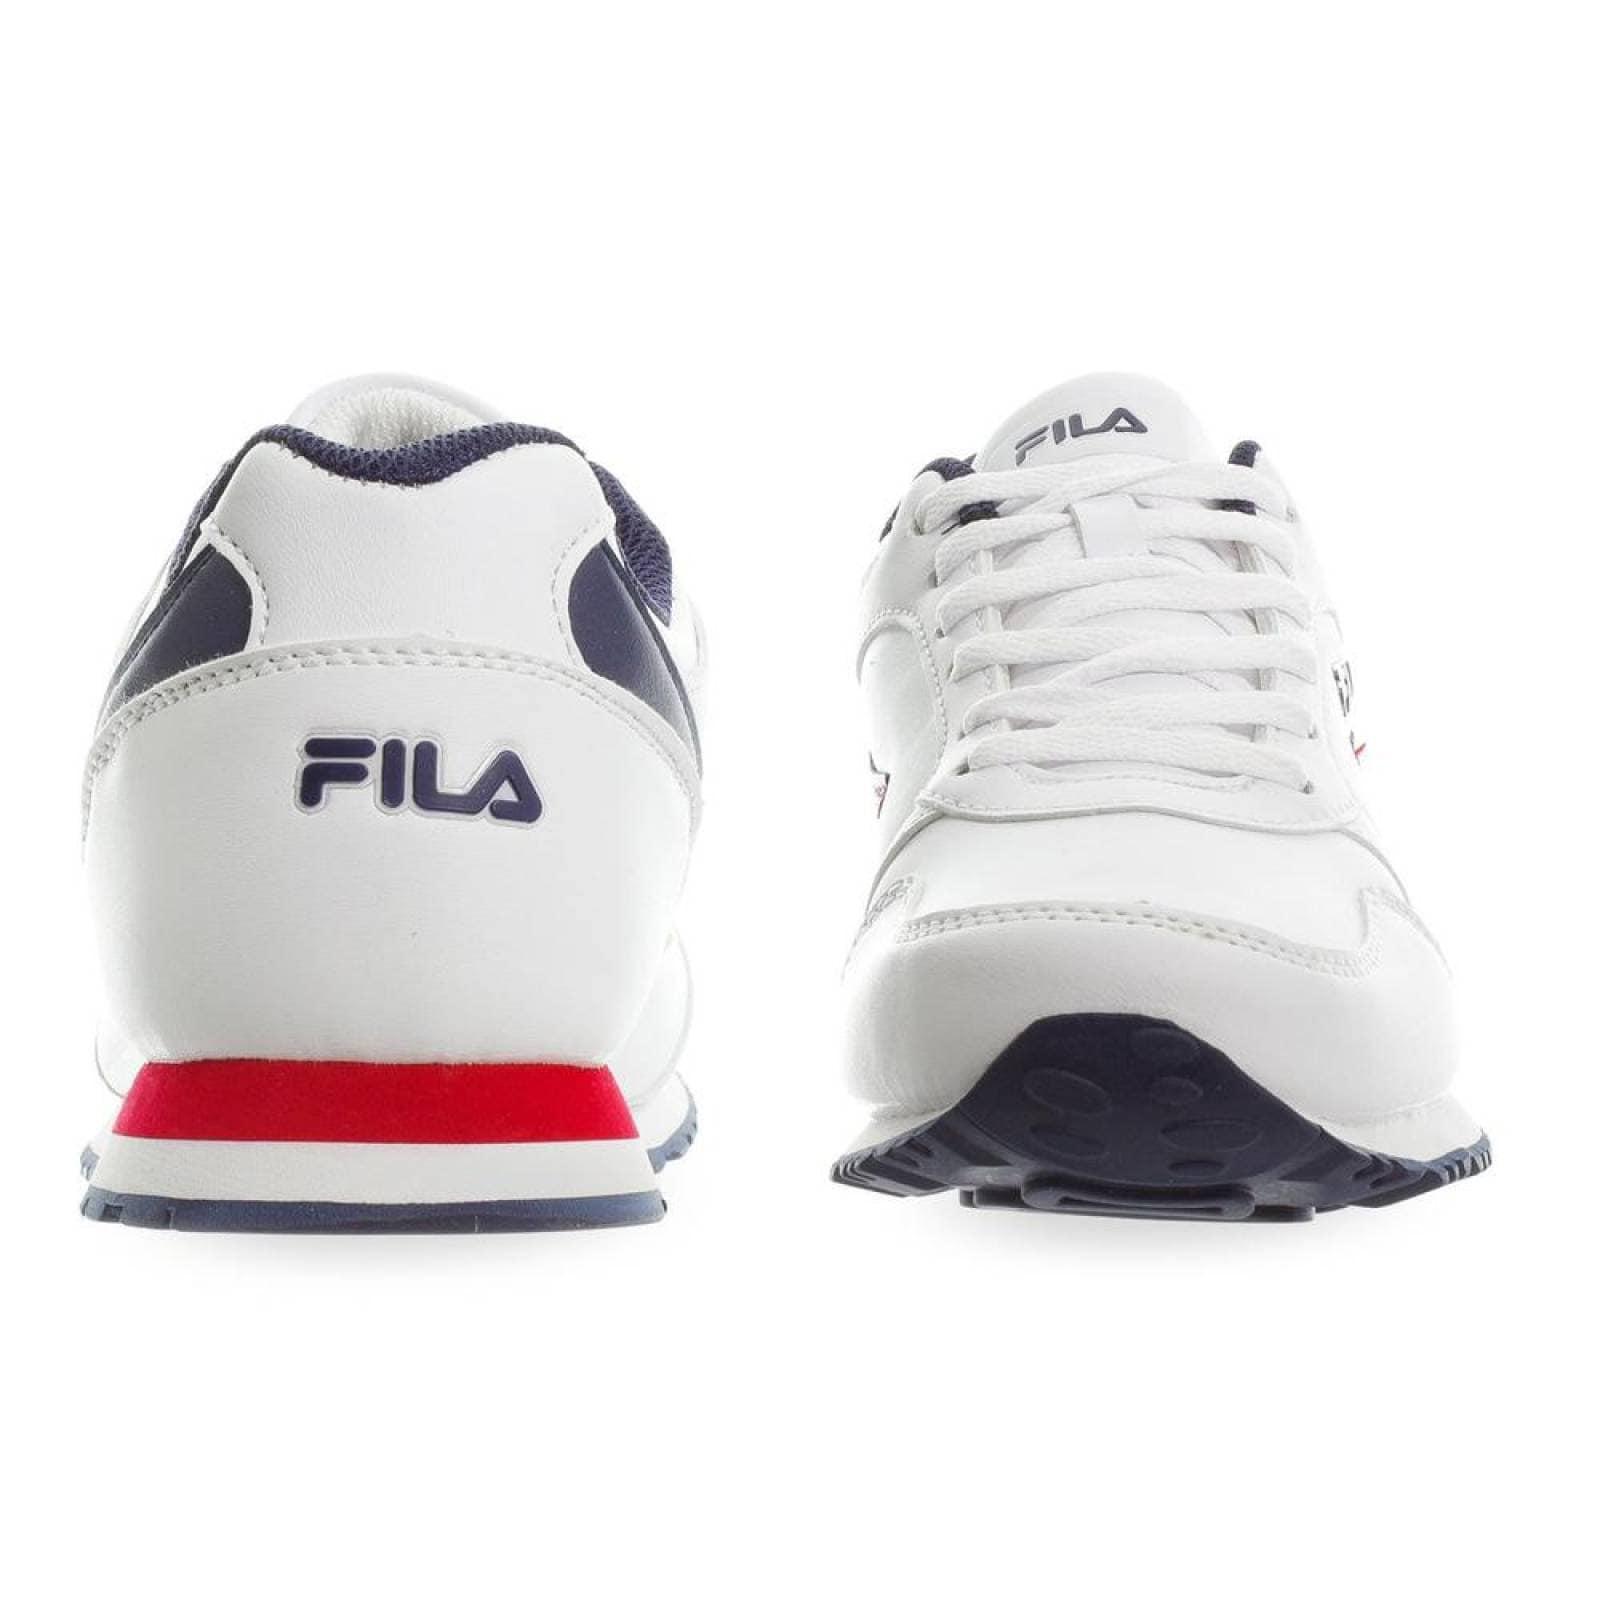 Tenis Fila Classico 18 - 1CM00141125 - Blanco - Hombre